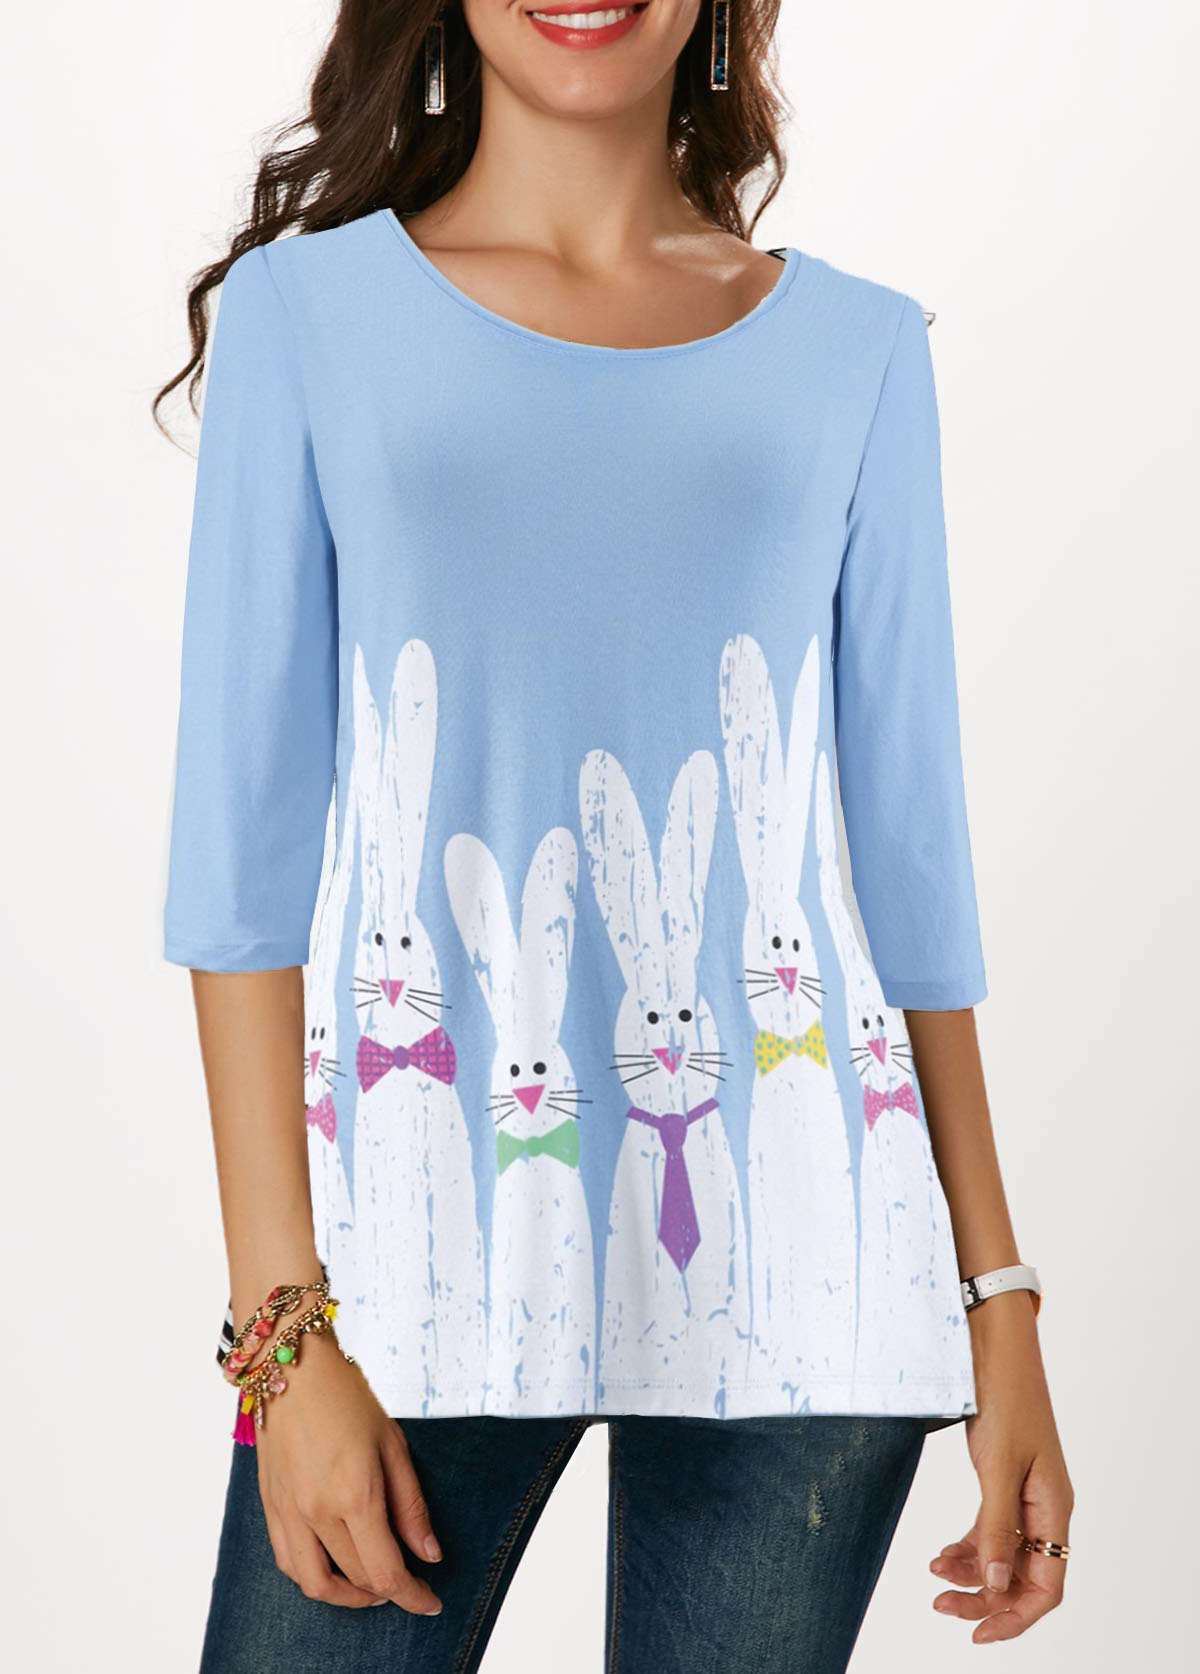 Rabbit Print Light Blue Easter T Shirt